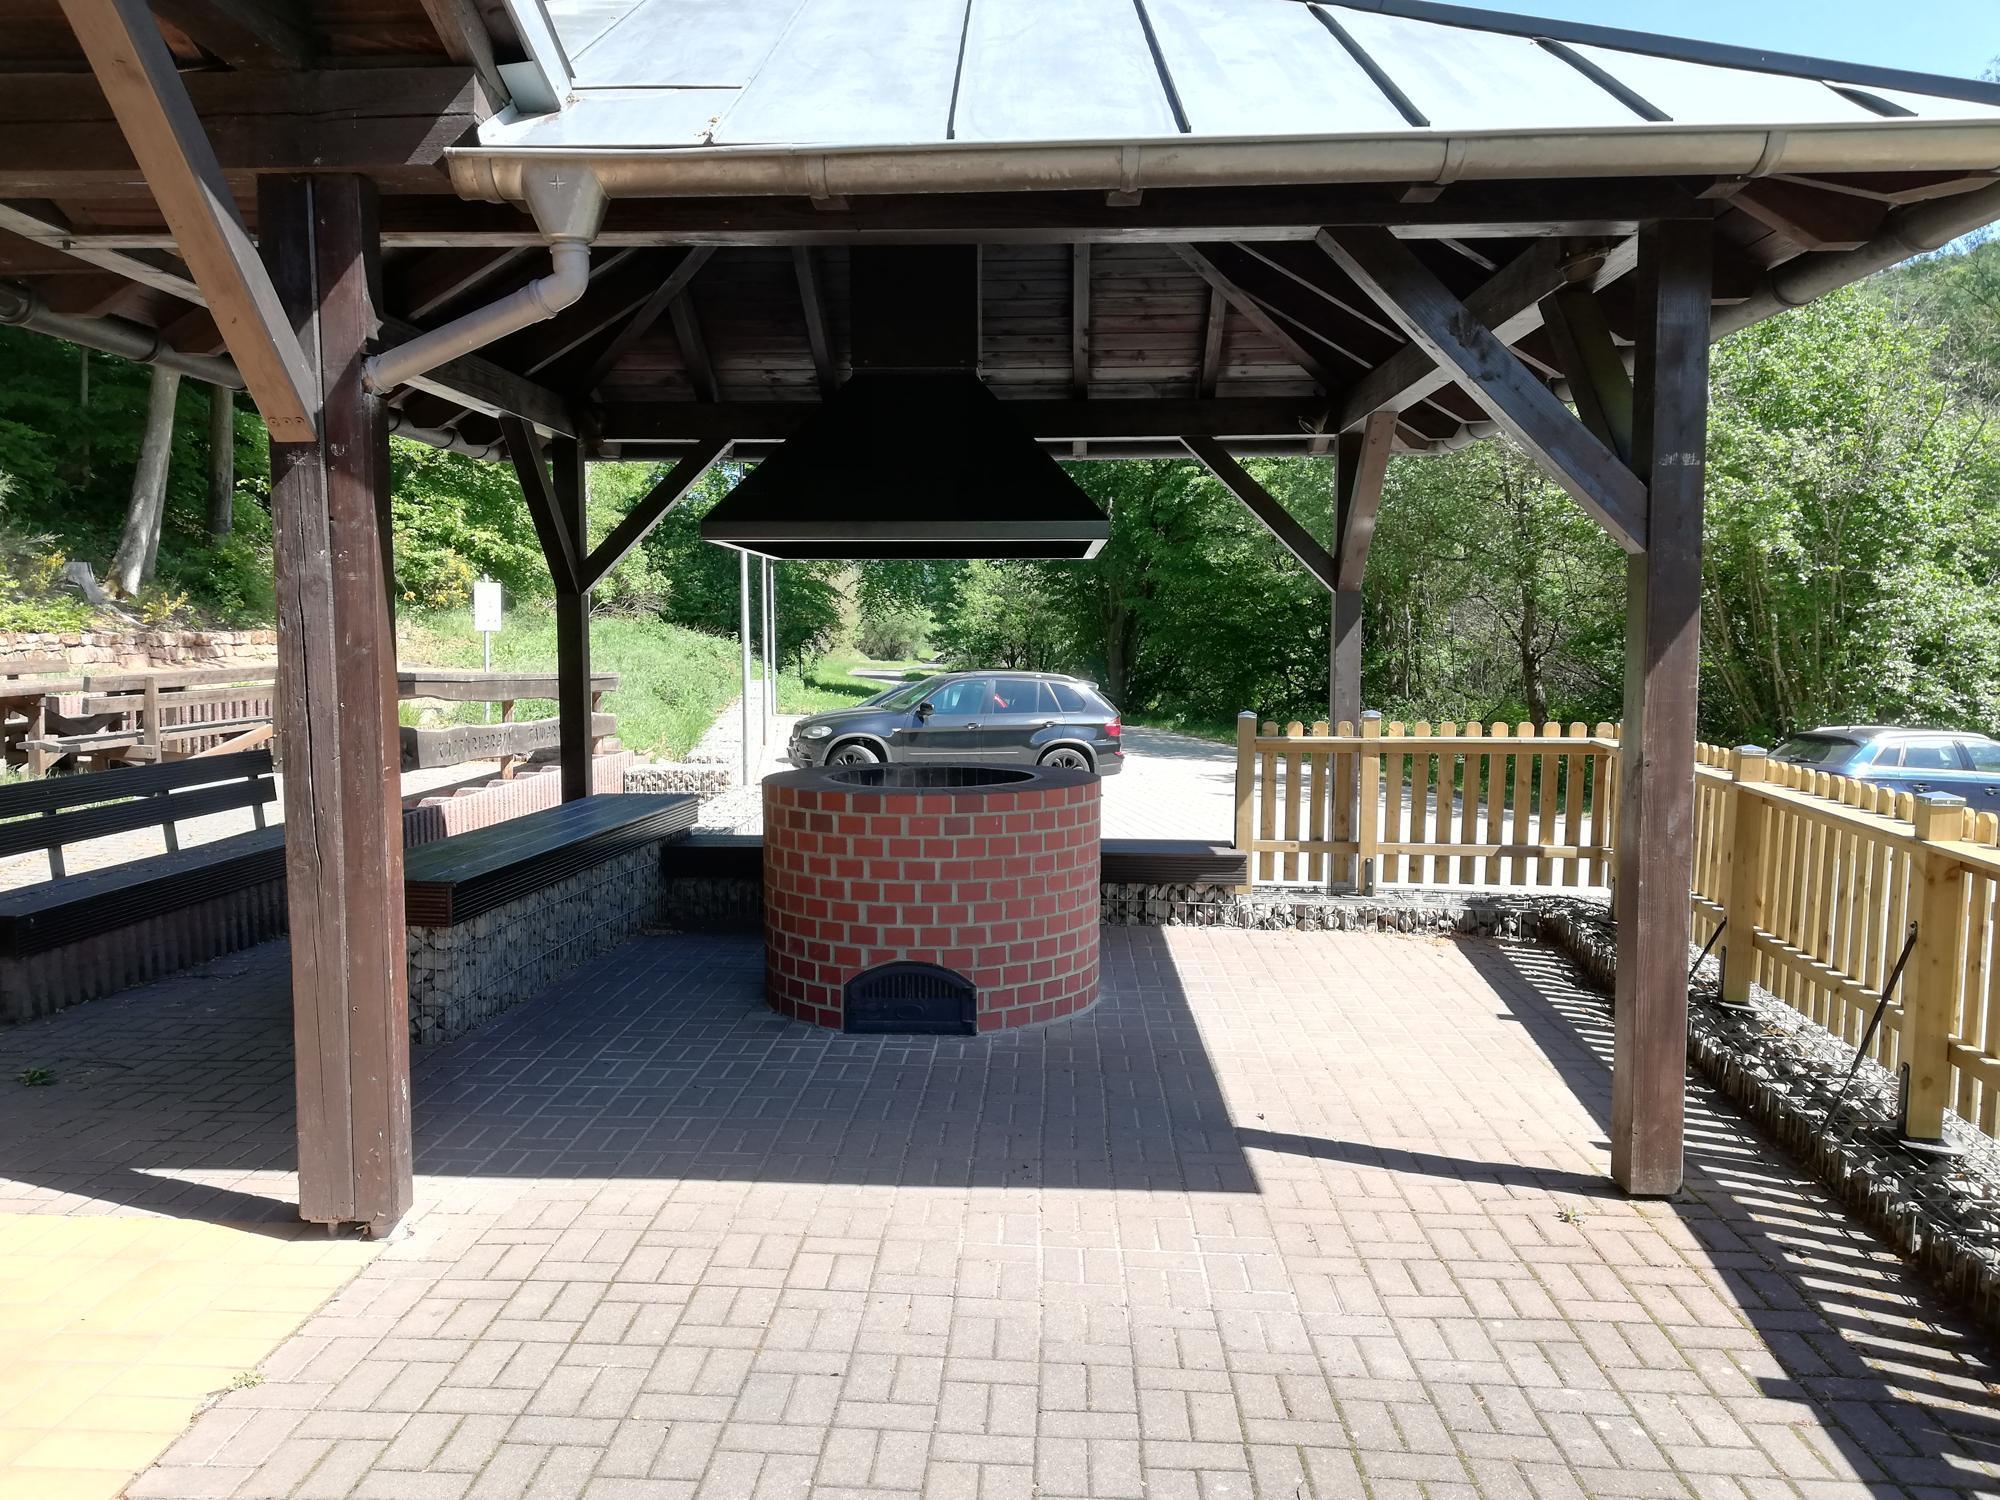 Grillhütte Tawern (3)